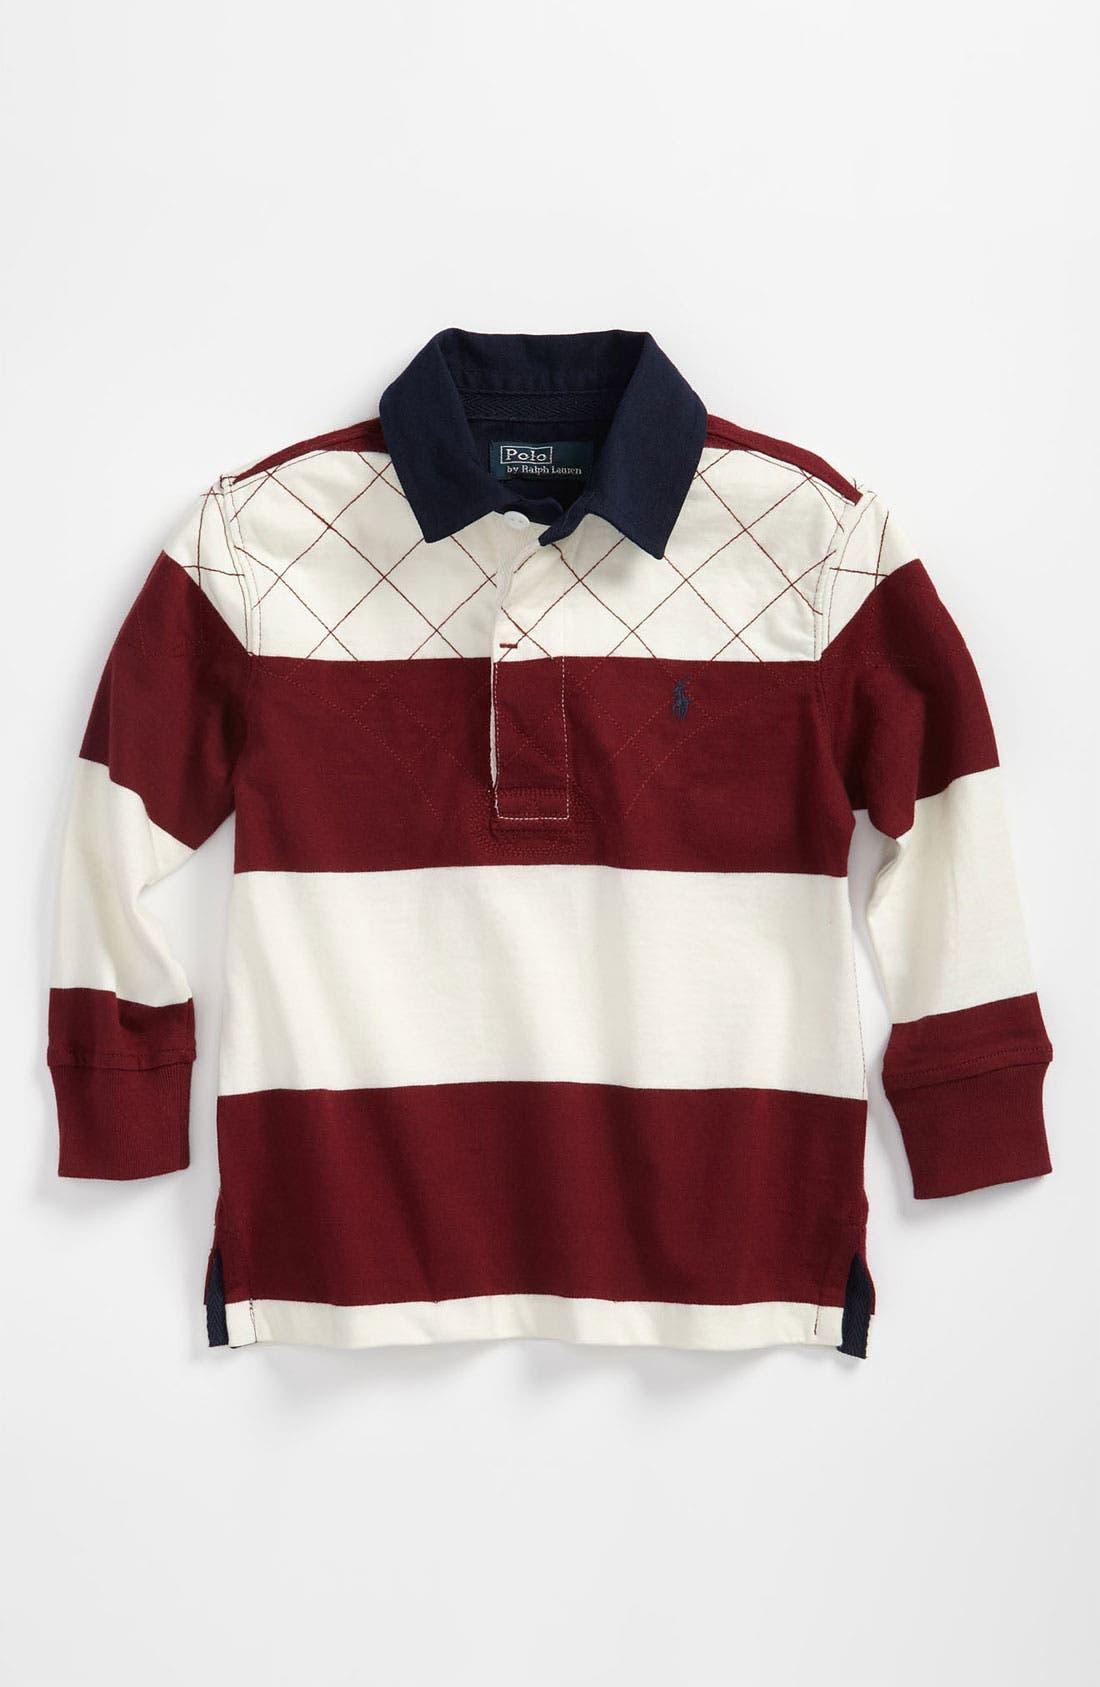 Main Image - Ralph Lauren Rugby Stripe Shirt (Toddler)